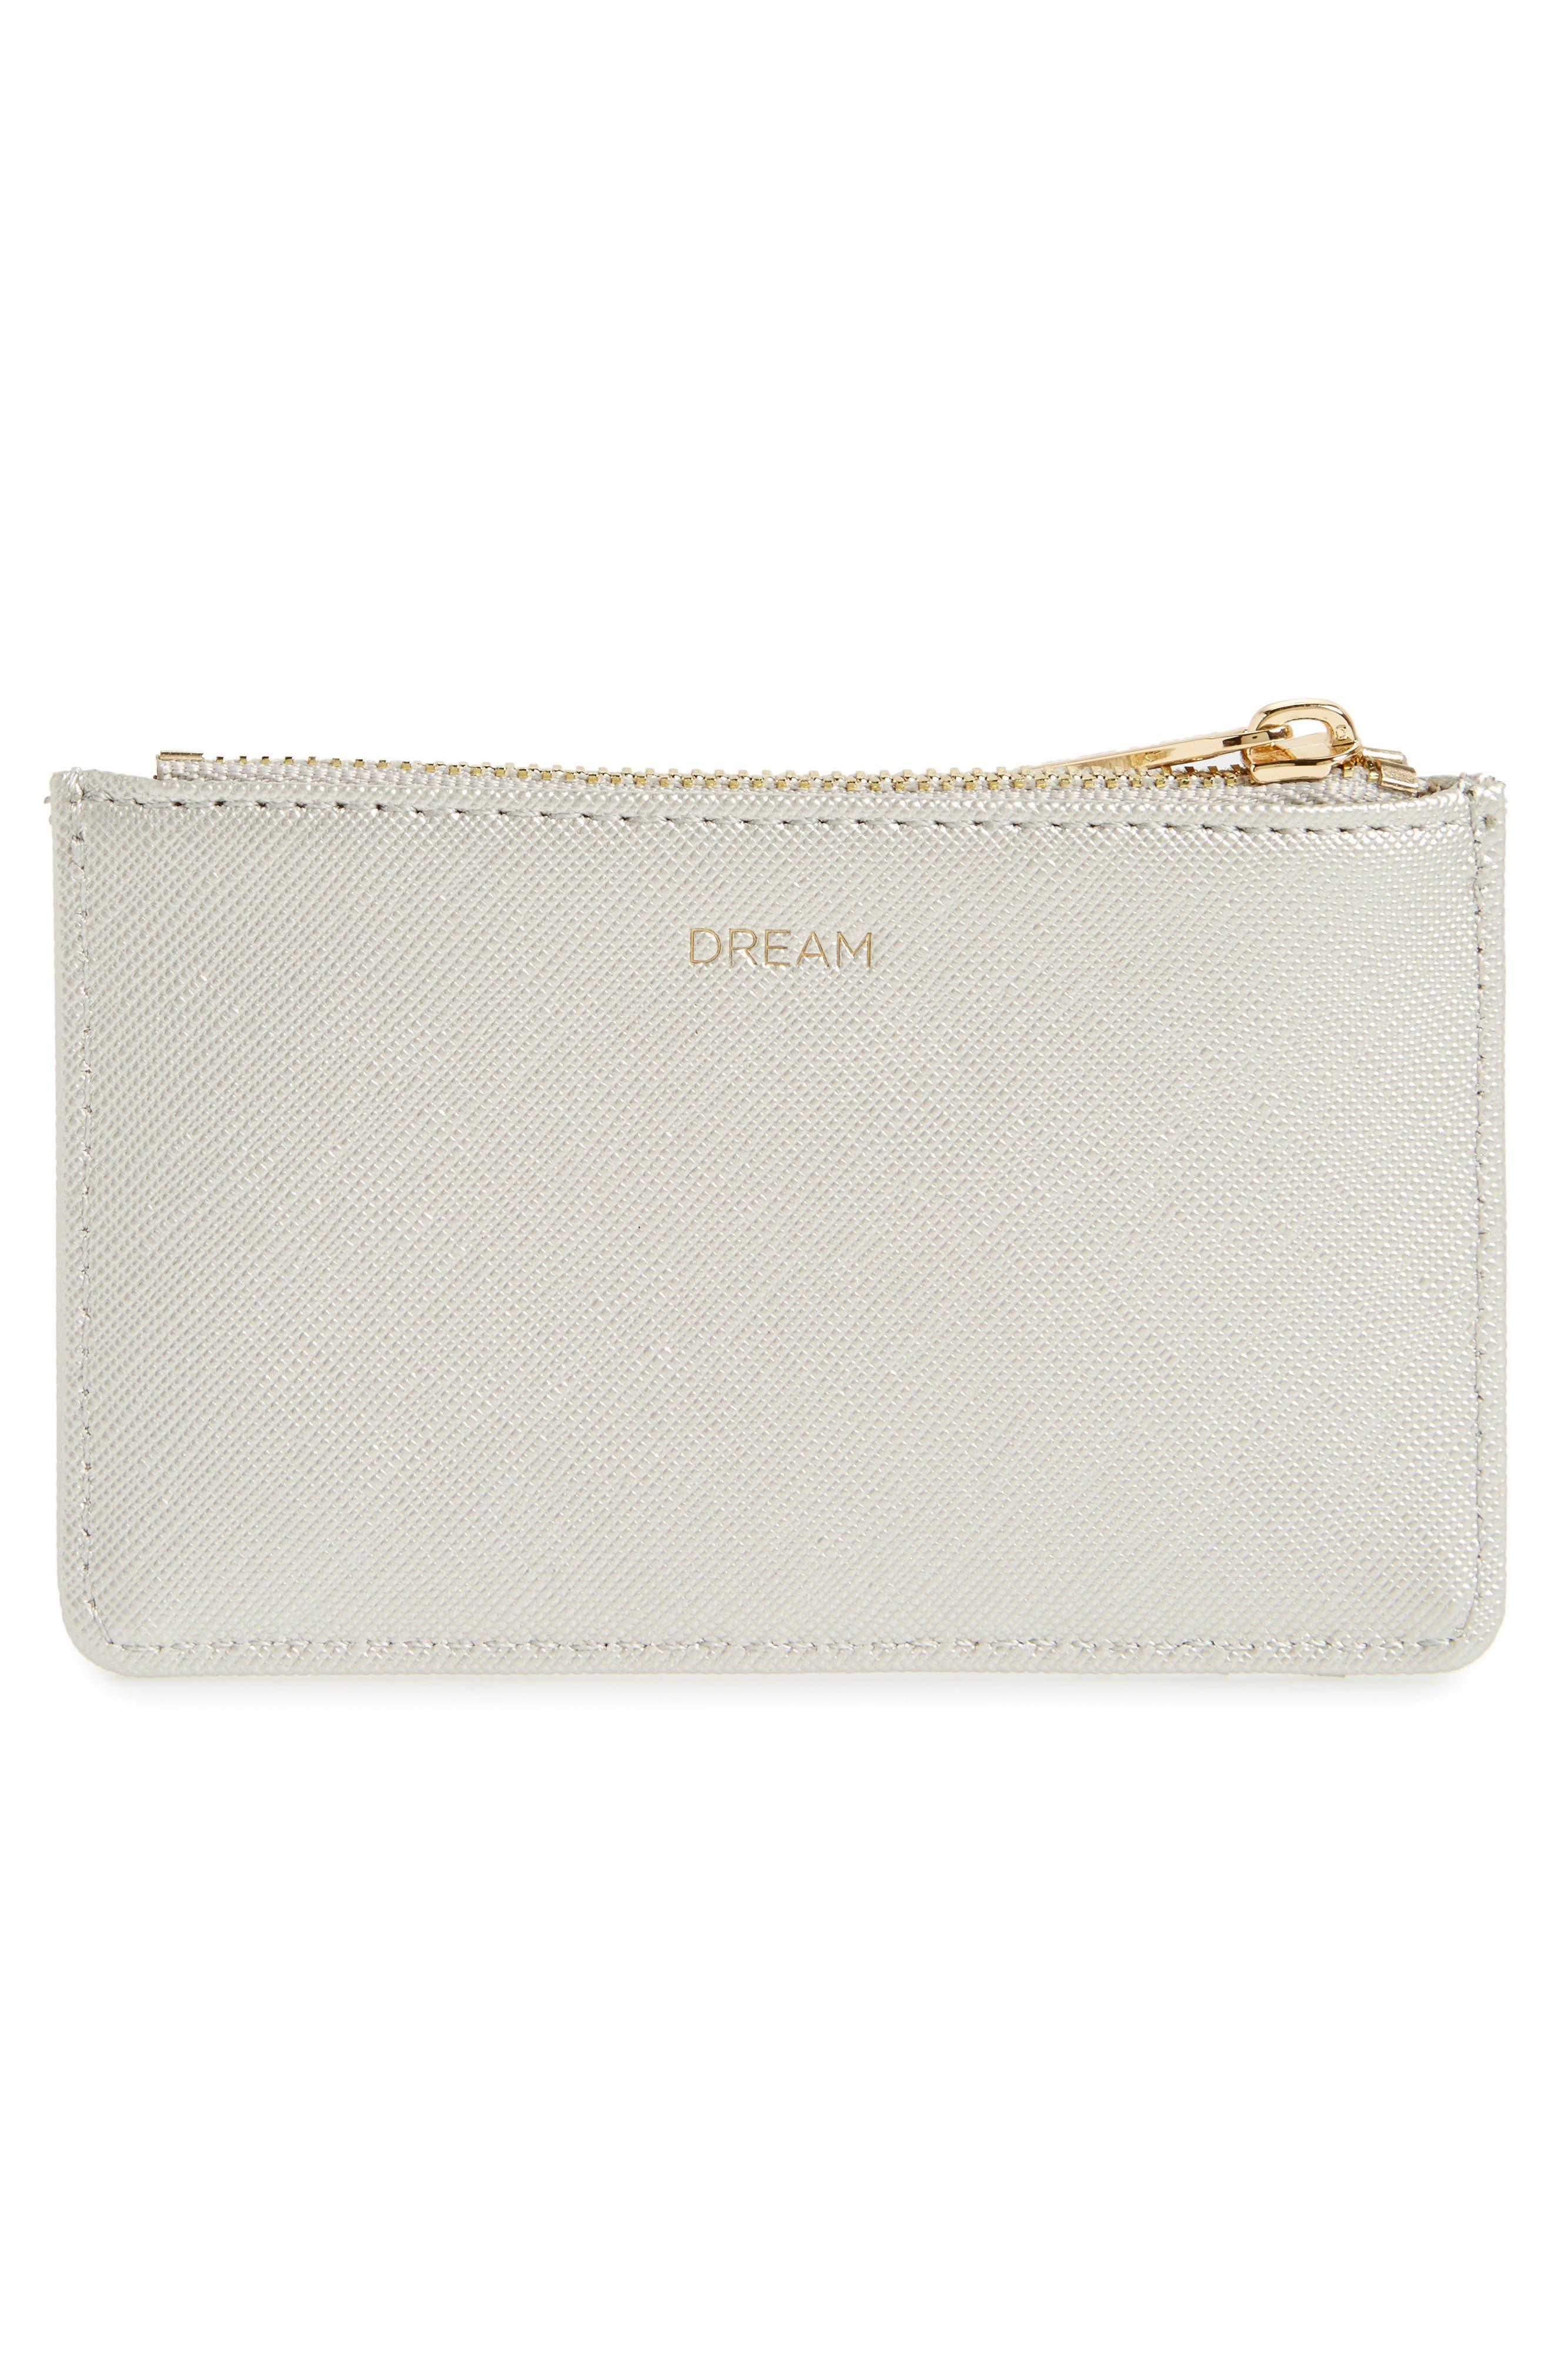 Dream Faux Leather Card Case,                             Alternate thumbnail 2, color,                             Silver